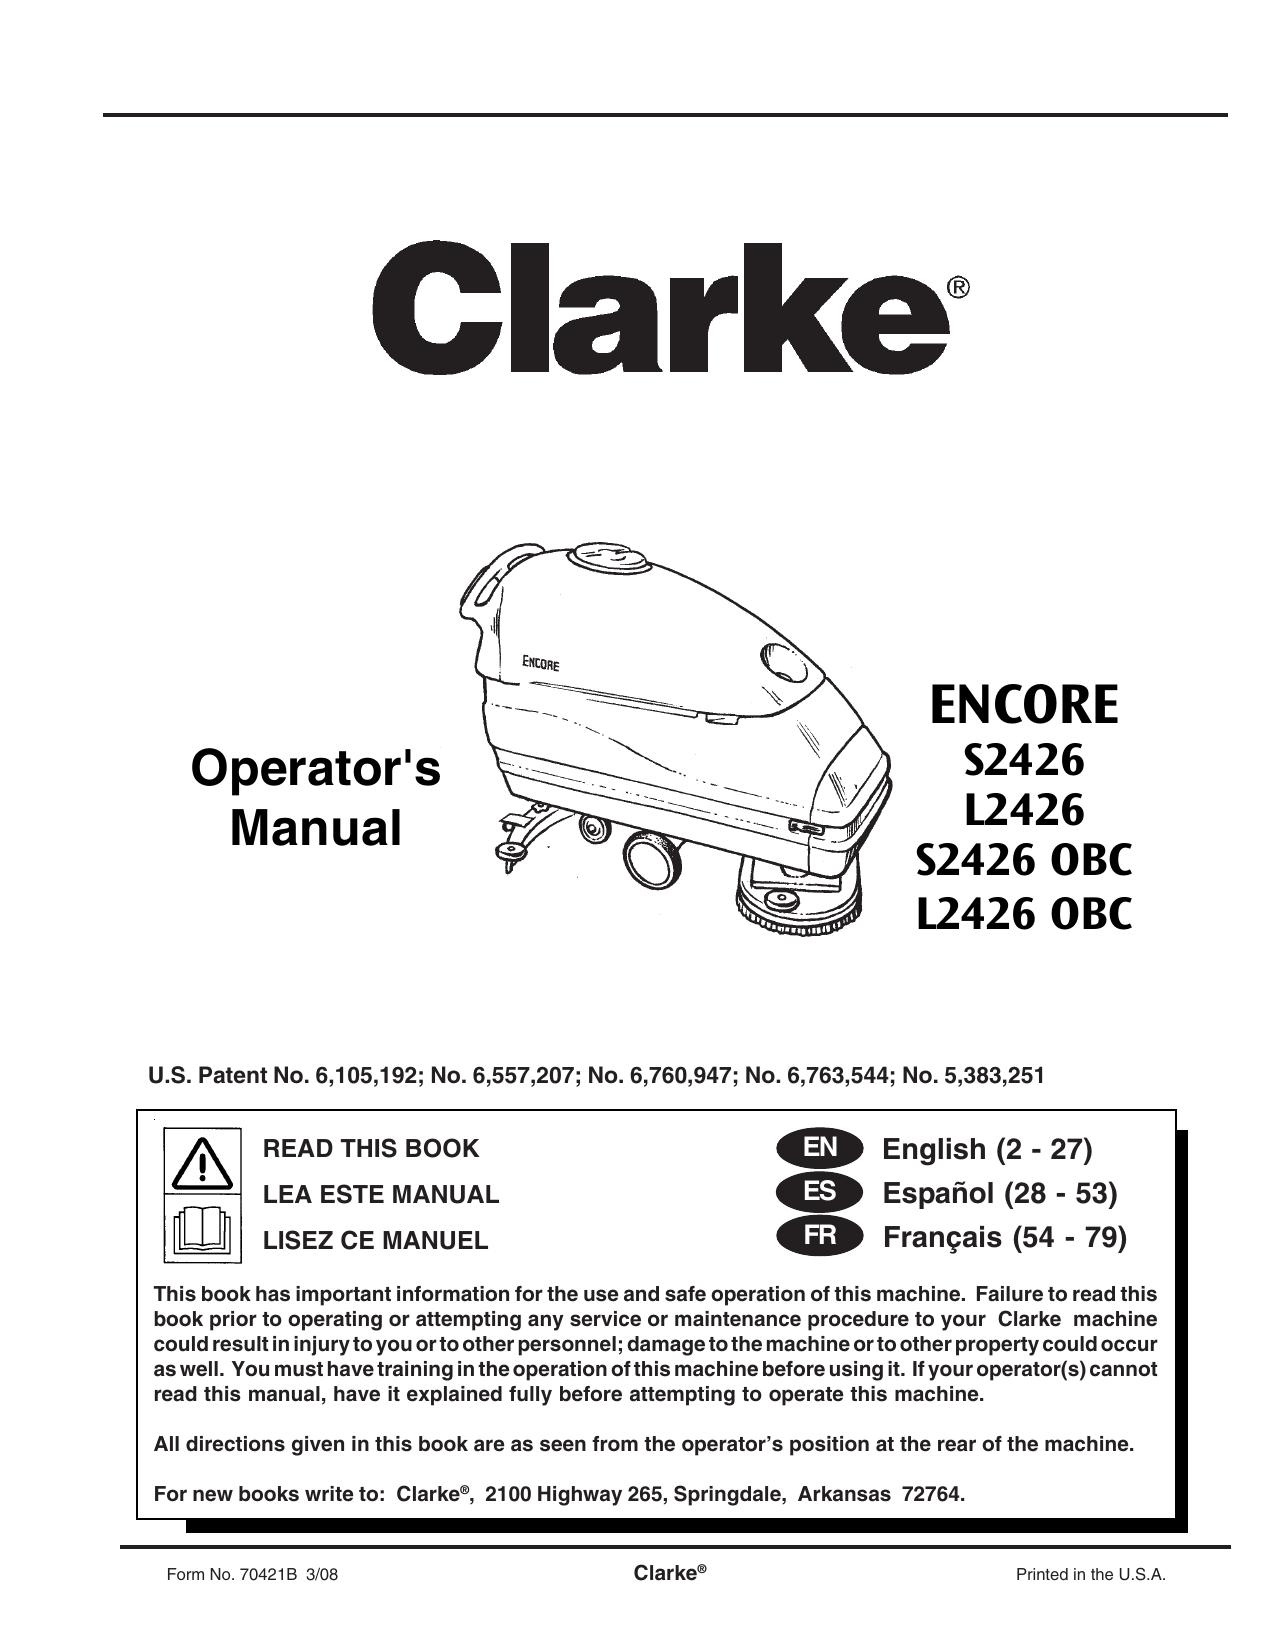 Clarke 13 Inch Pad Holder 17531A